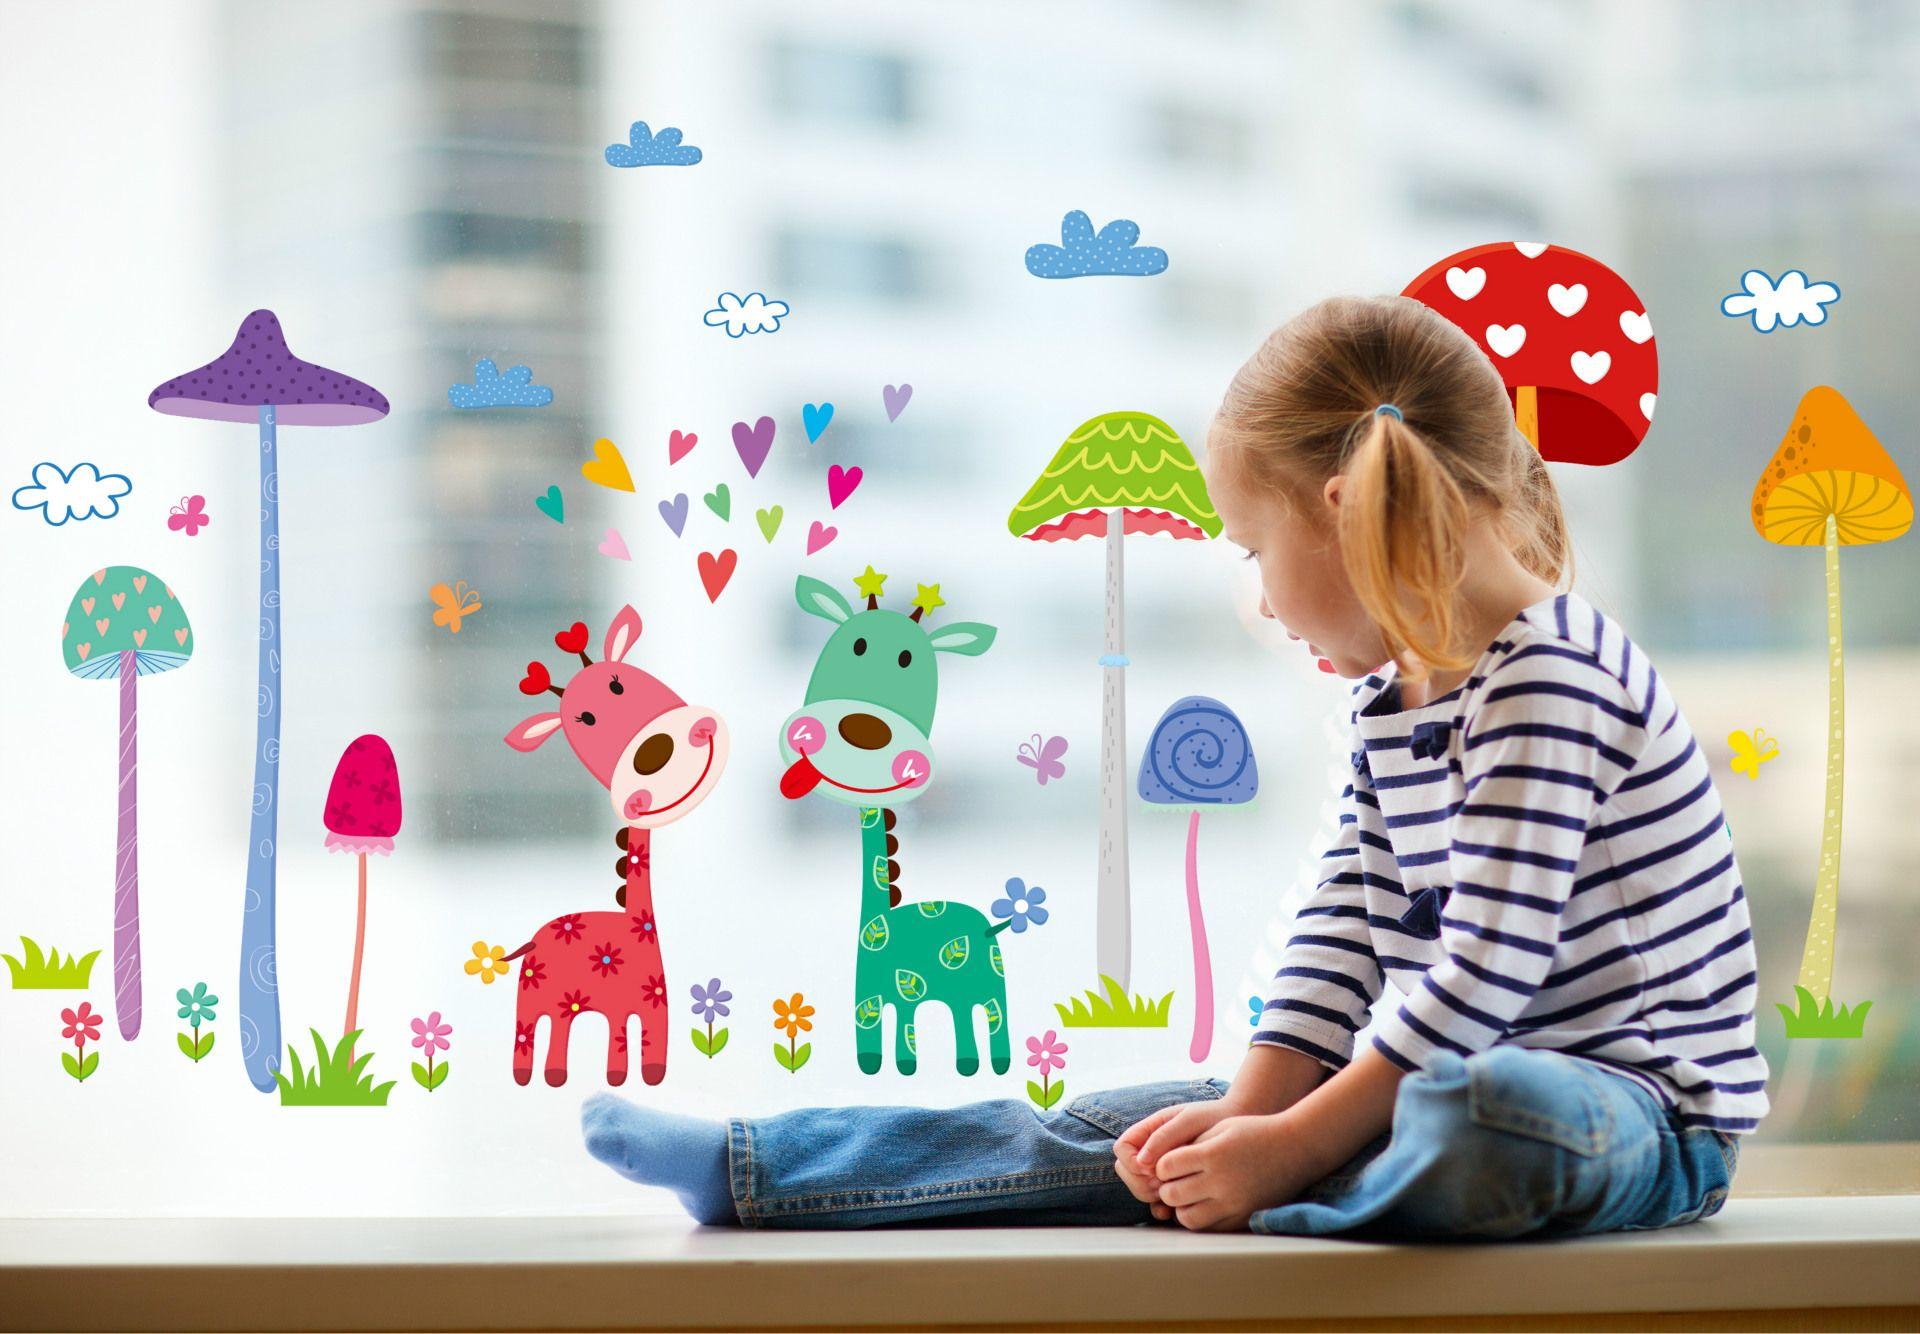 3d Wallpaper For Kid Bedroom Forest Mushroom Deer Animals Home Wall Art Mural Decor